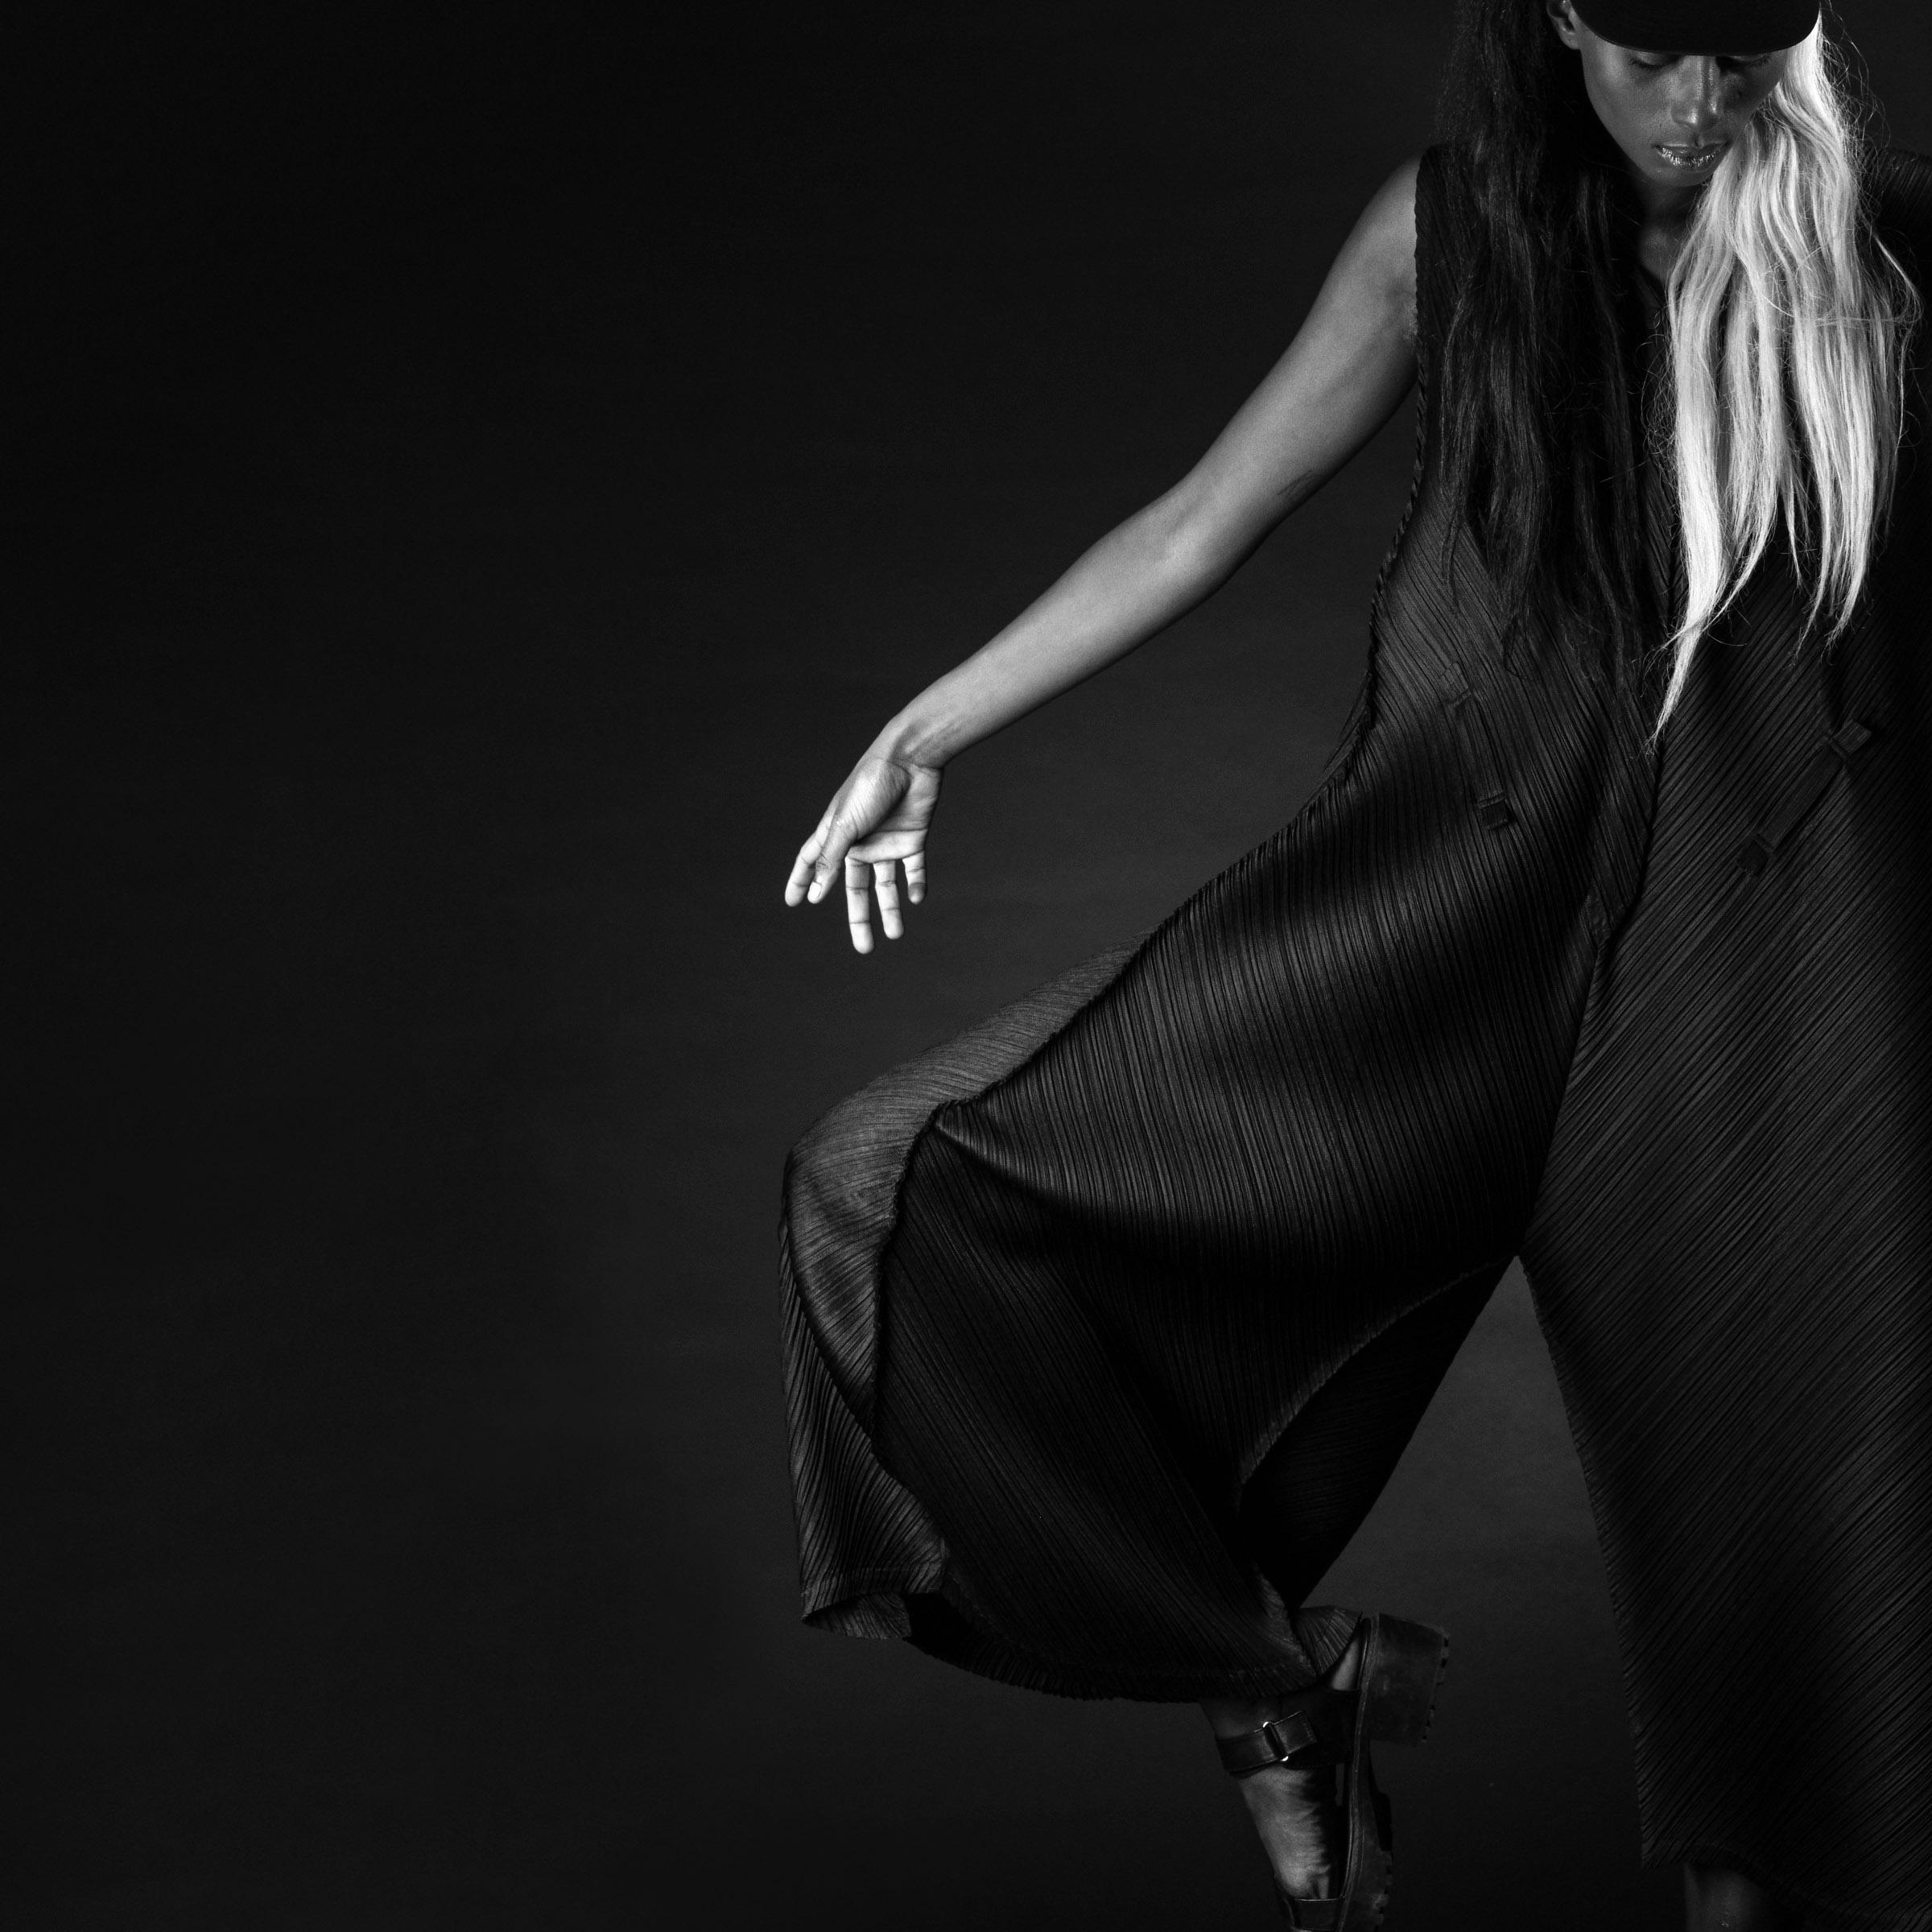 Model: Ness ● Designer: Issey Miyake ● Art director: Eric Nehr